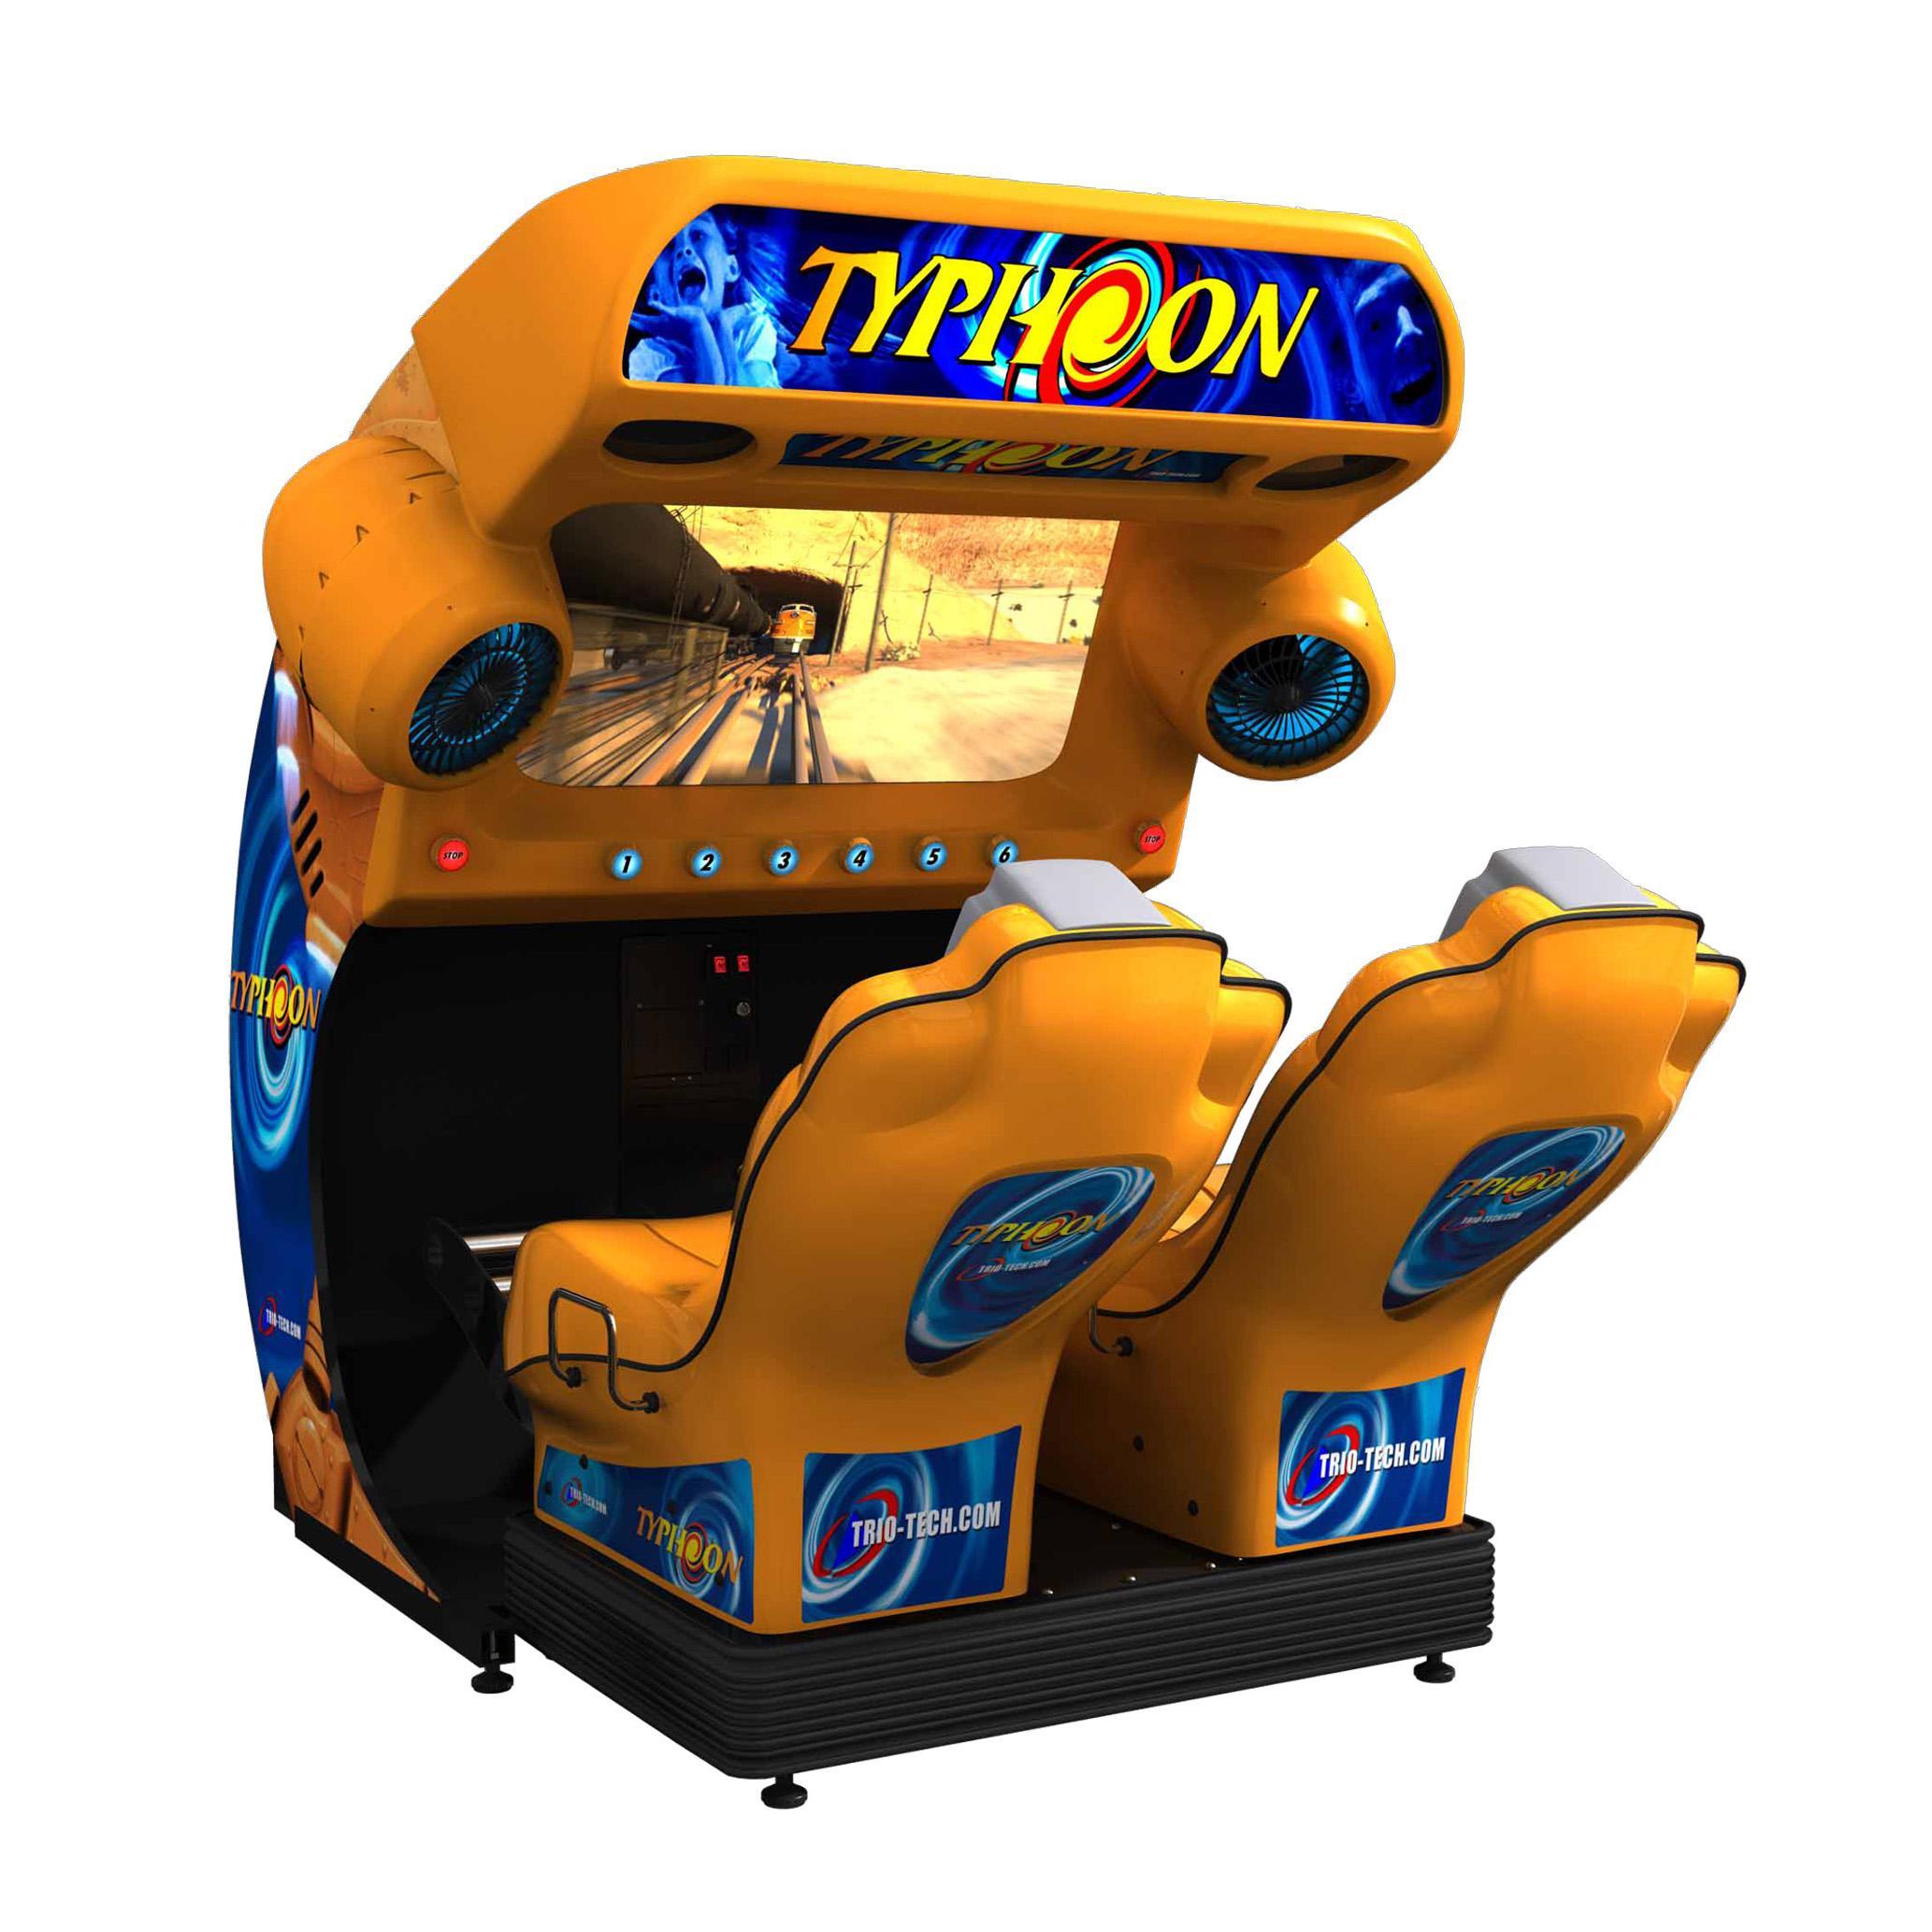 Typhoon video simulator game